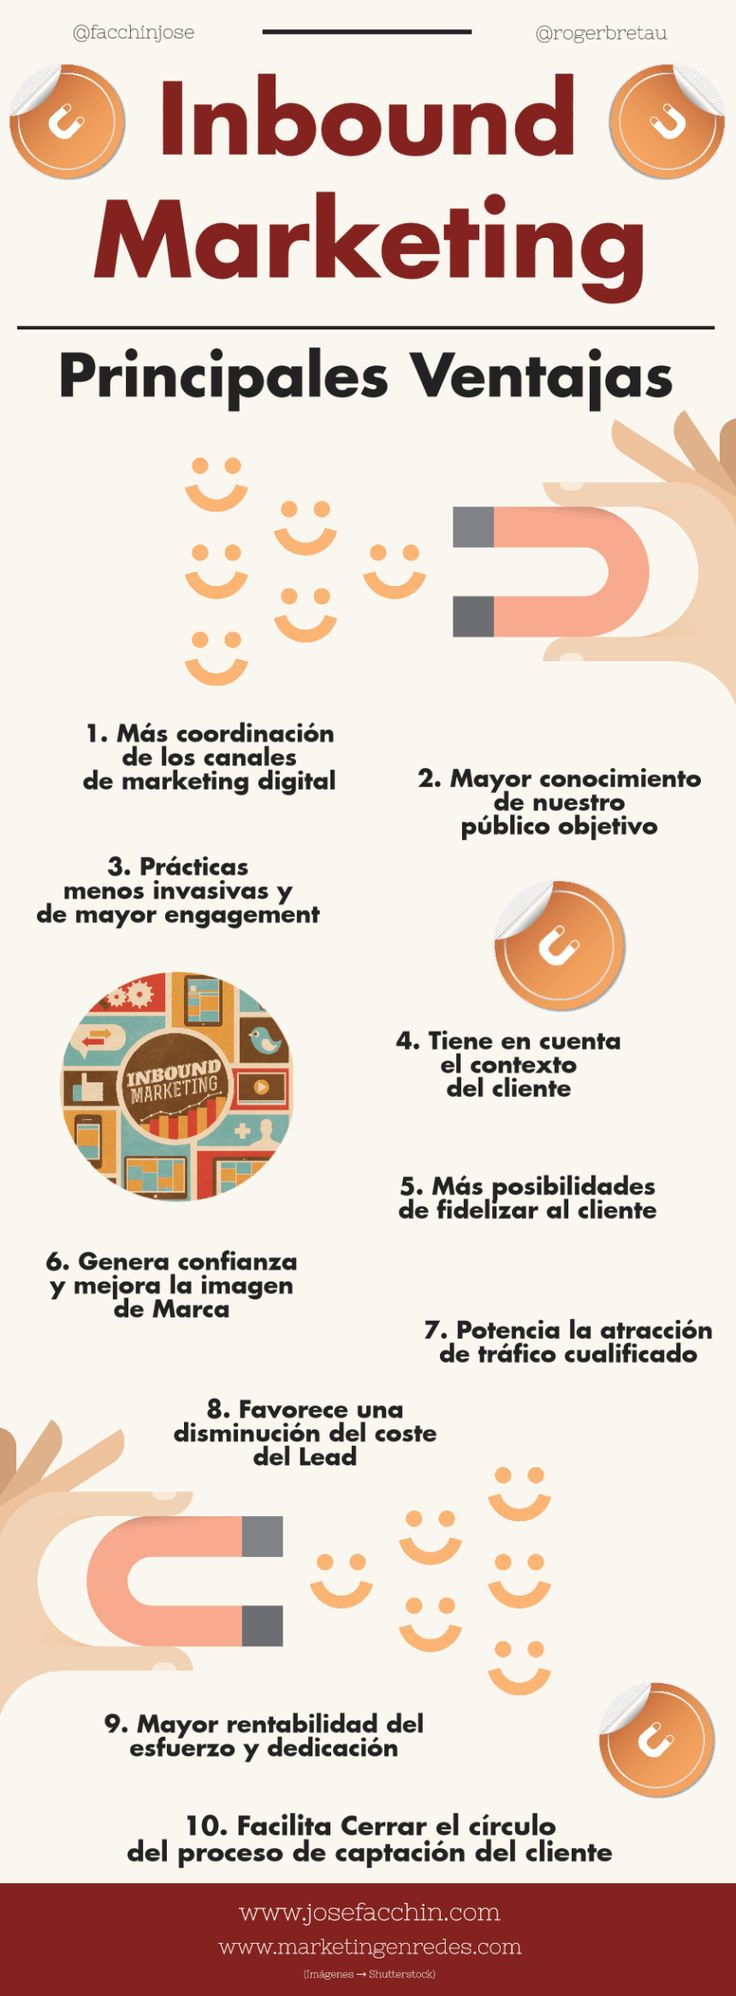 10 ventajas del Inbound Marketing. Infografia en español. #CommunityManager